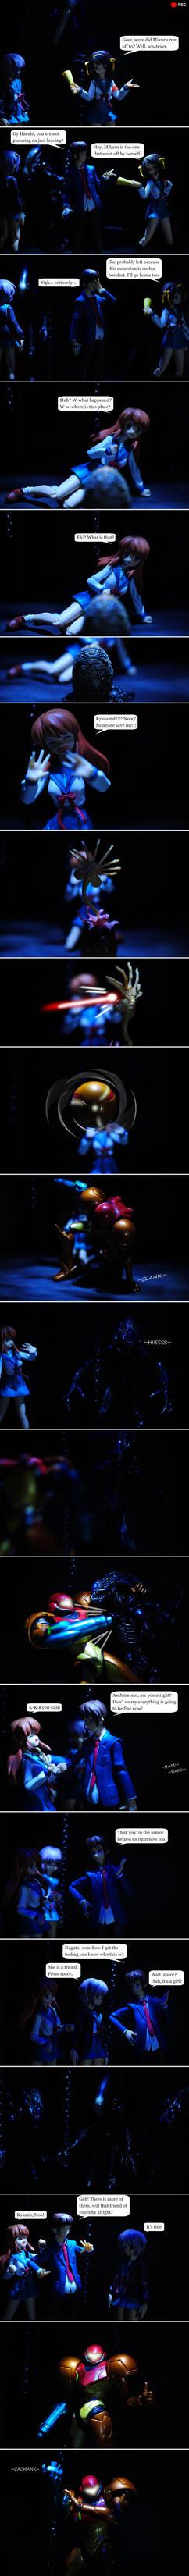 Mikuru's Close Encounter part 2 by Miettechan